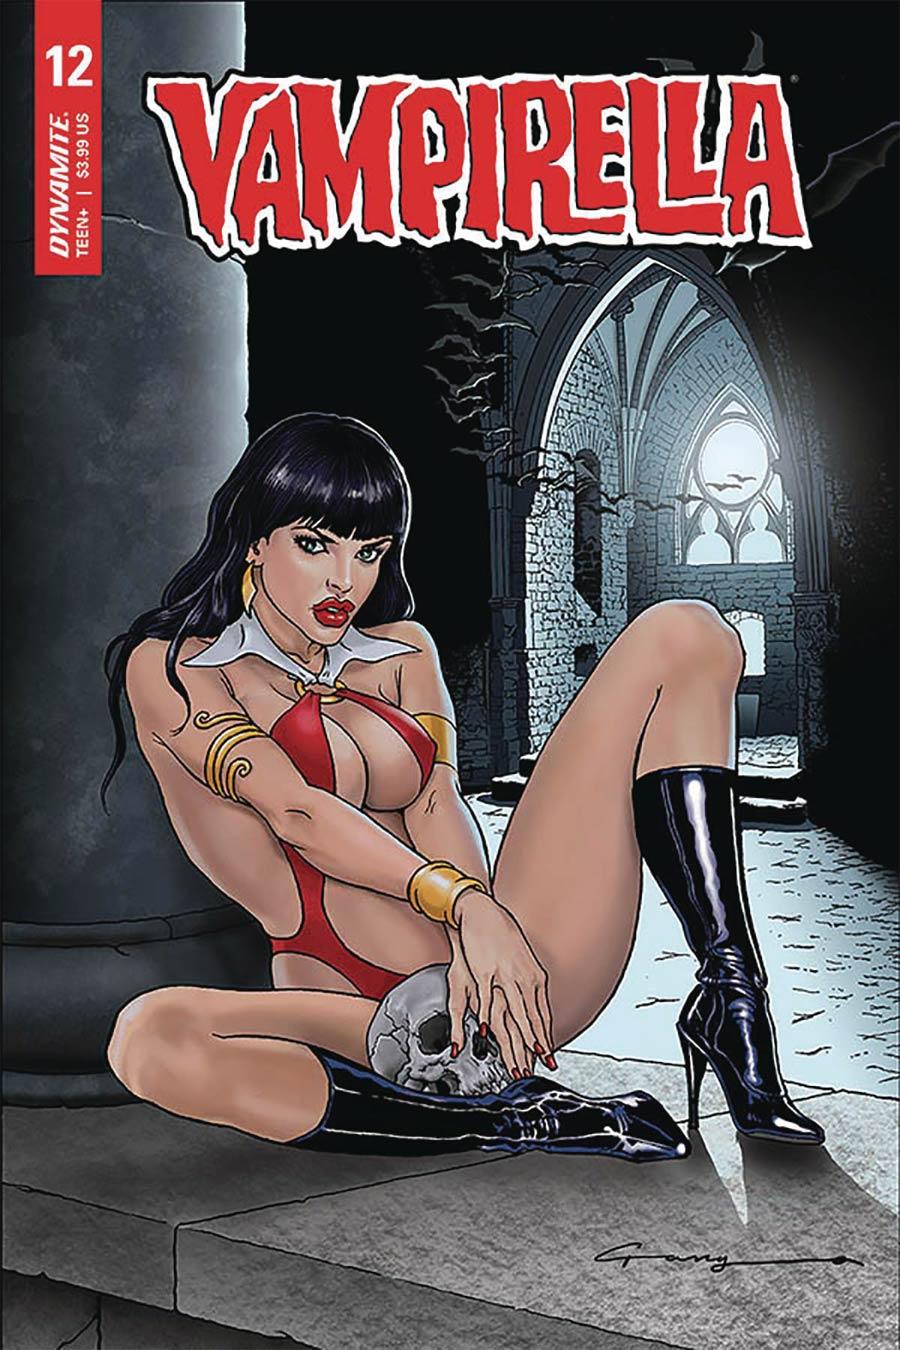 Vampirella Vol 8 #12 Cover B Variant Levend Canga Cover